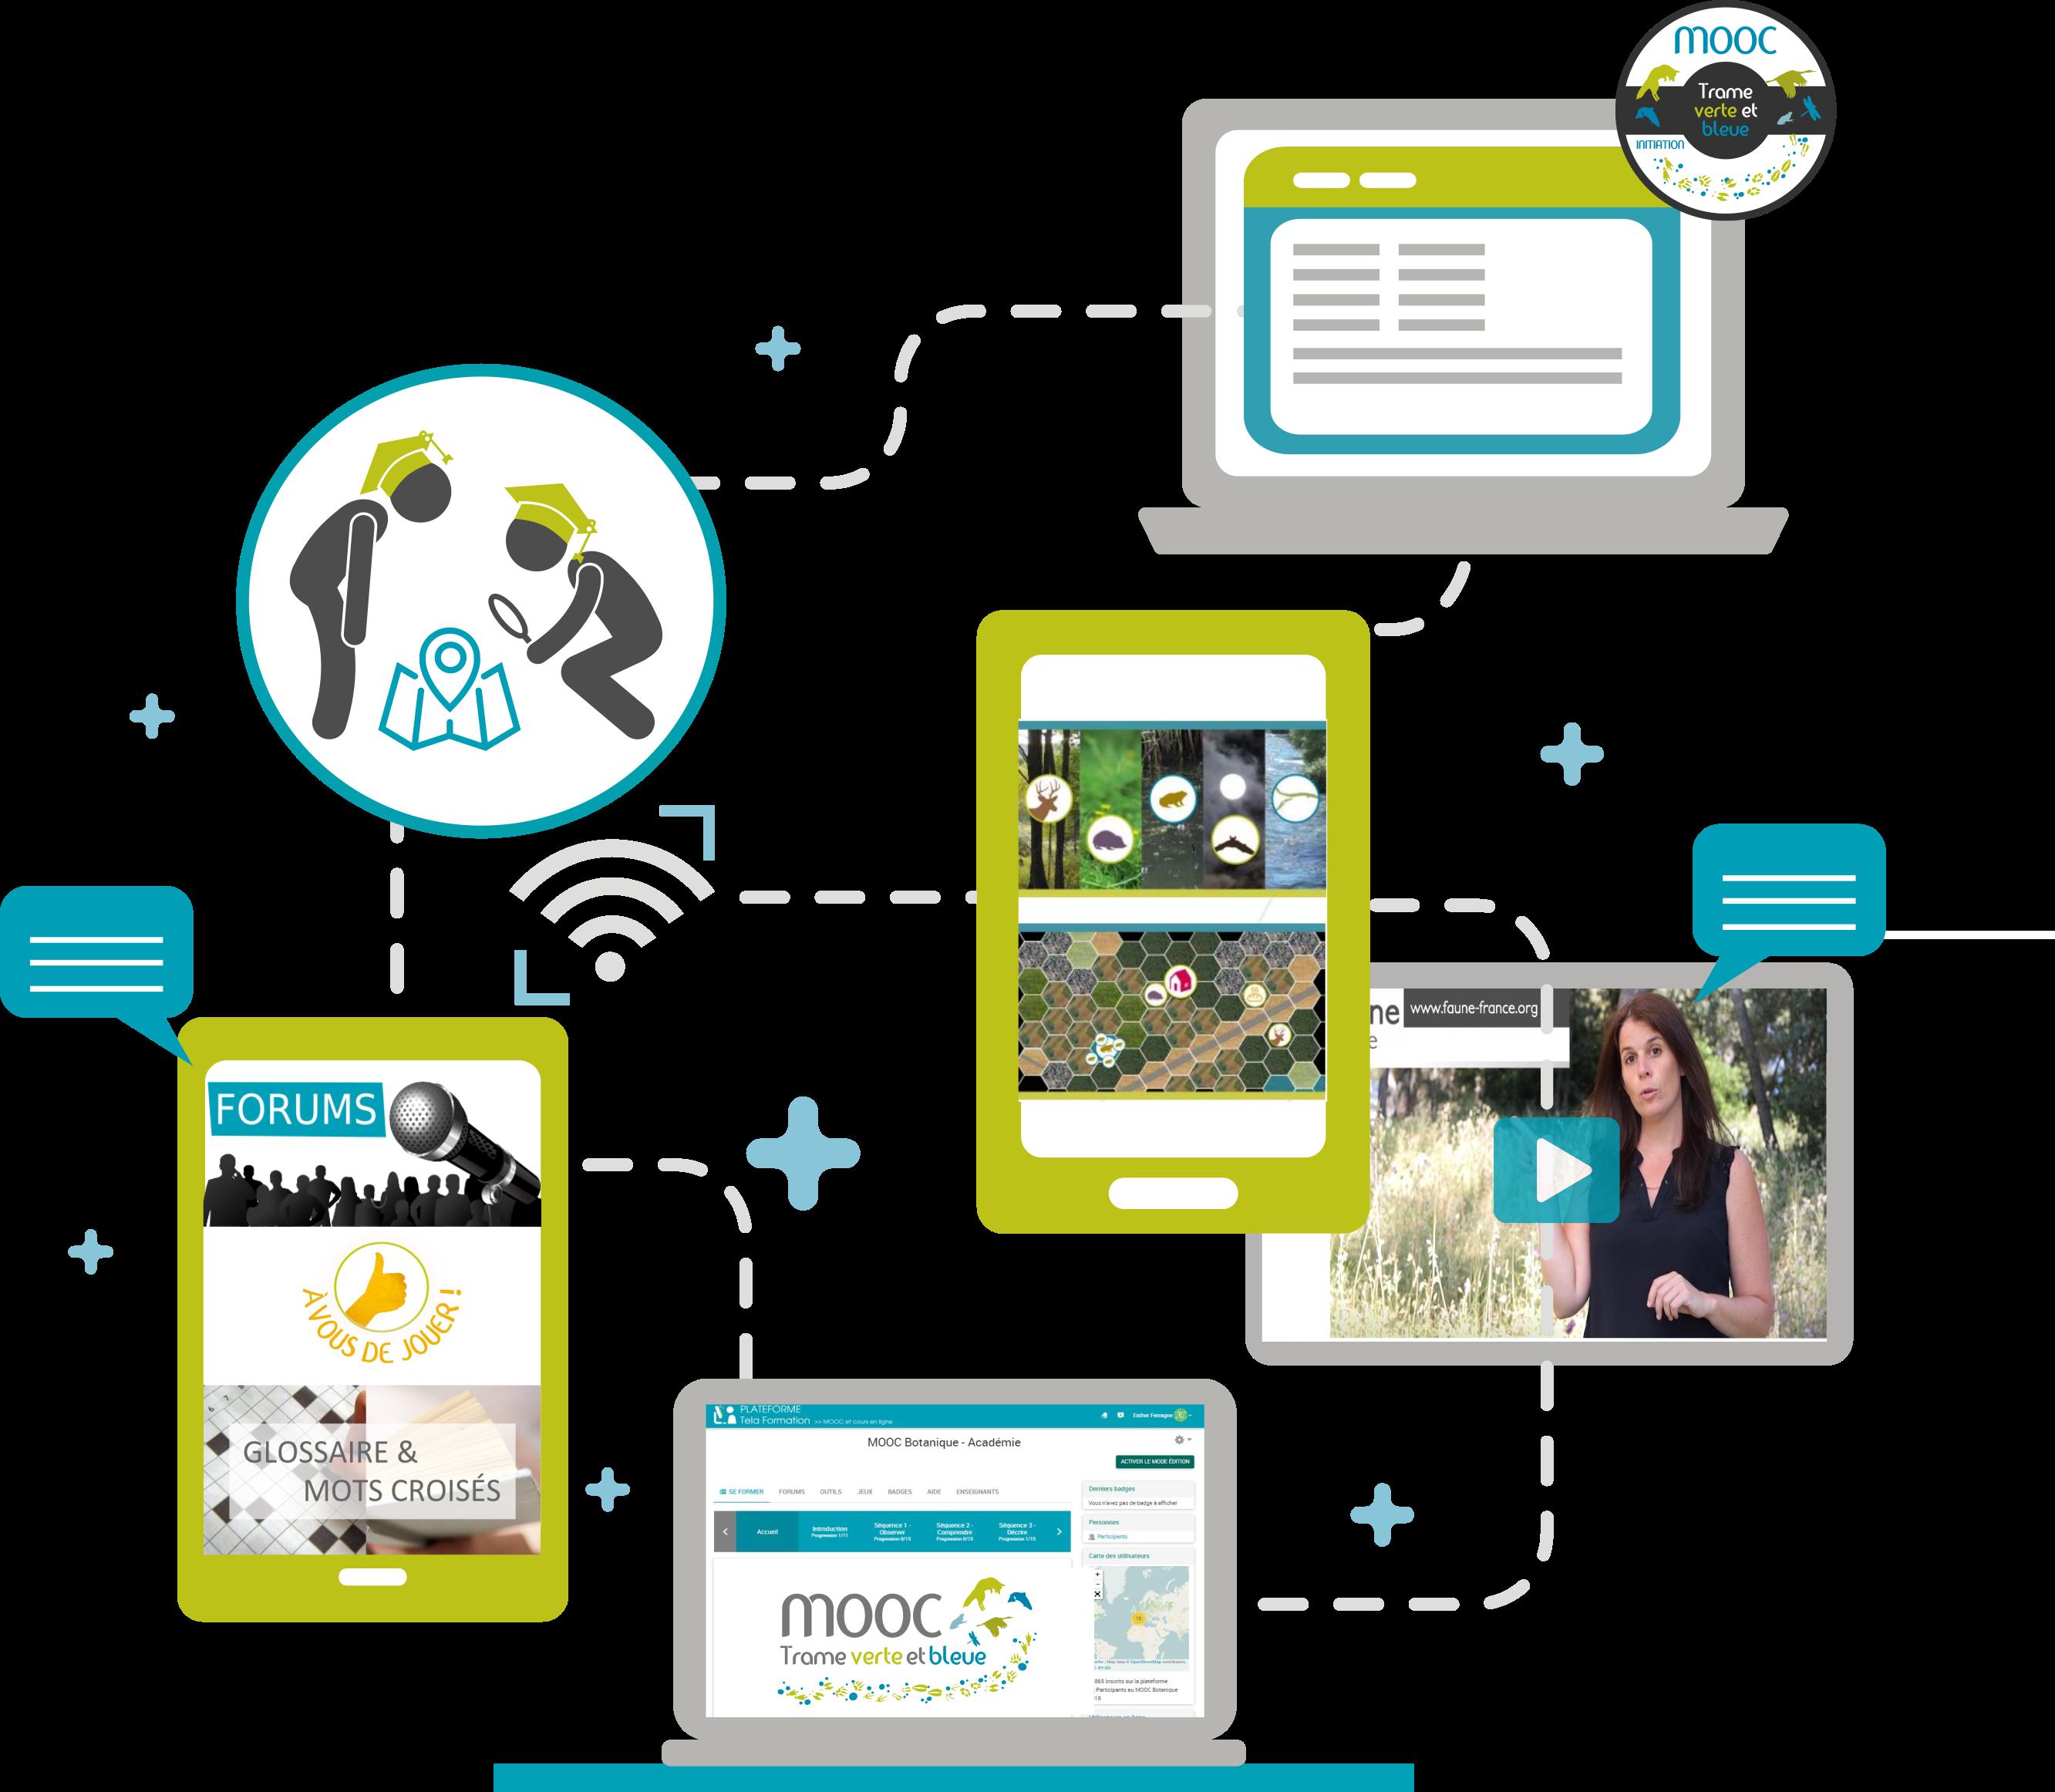 ressources du MOOC